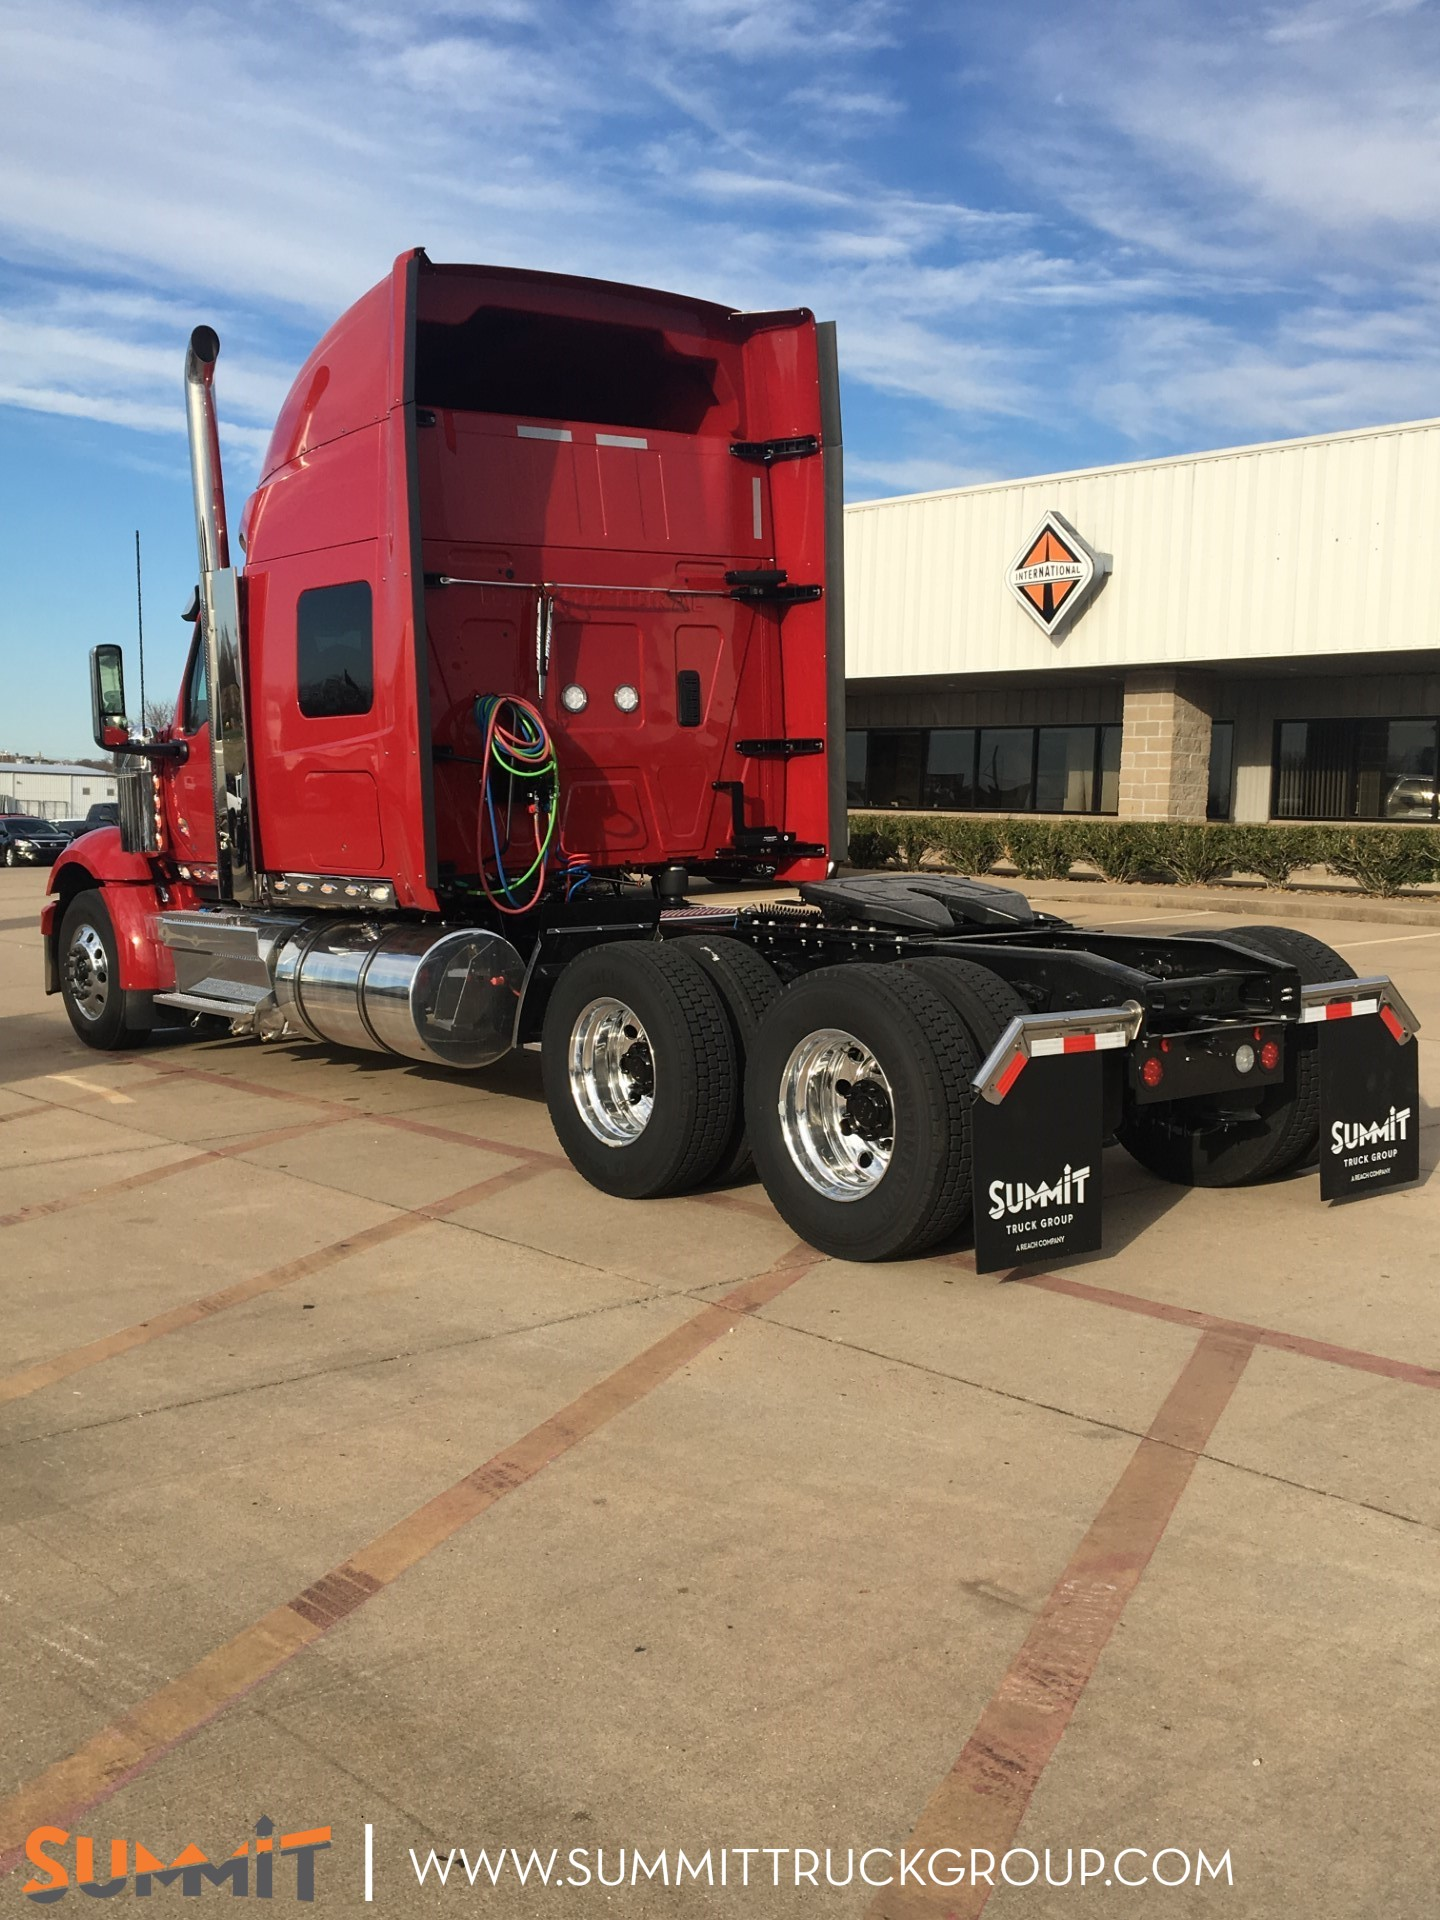 2021 International LoneStar Sleeper Cab 6x4, Tractor #MN523149 - photo 1